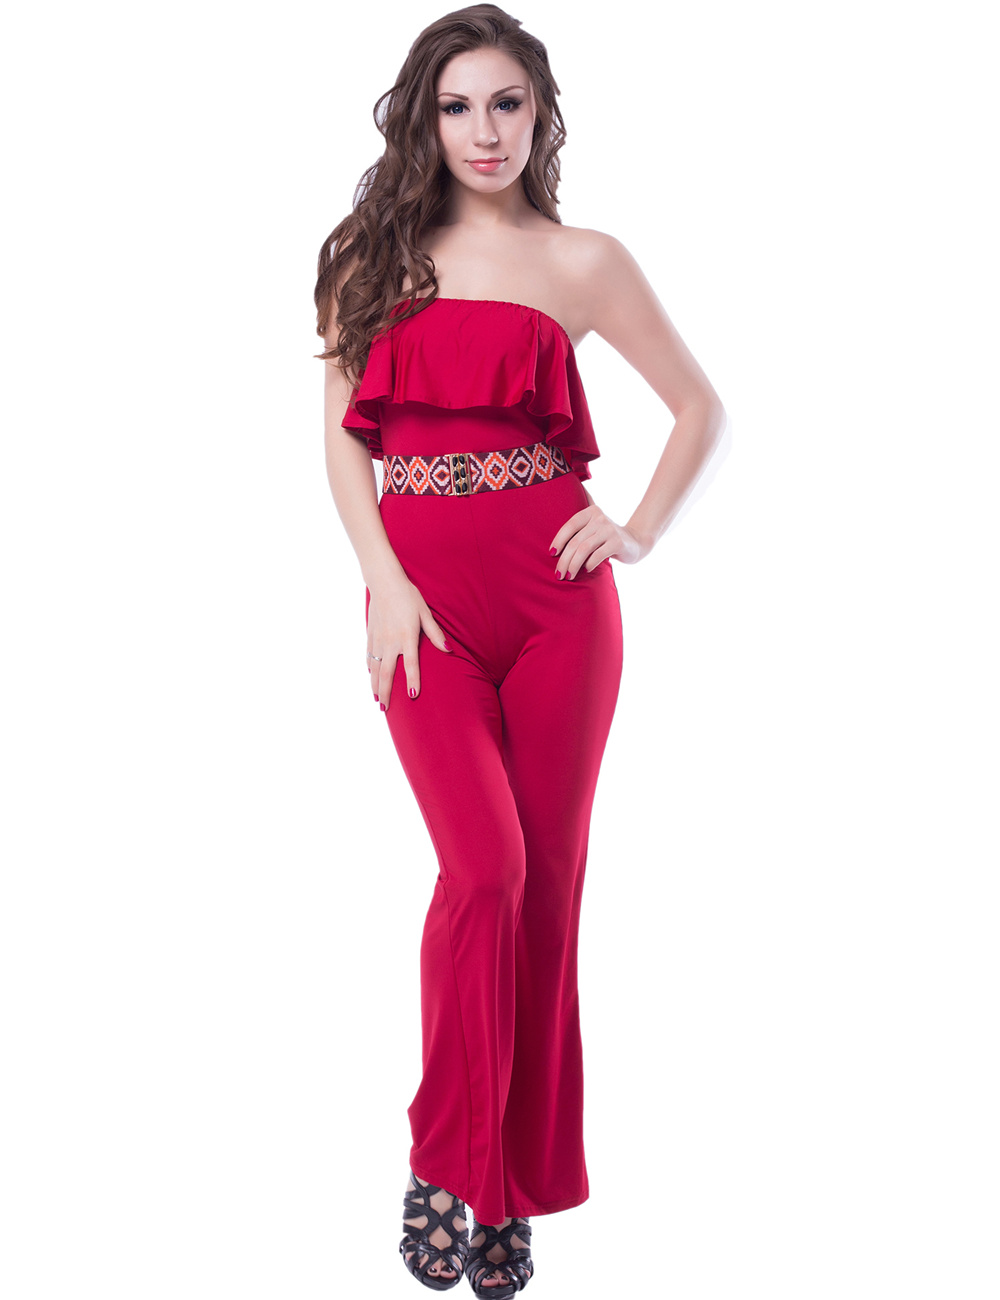 09761926e0a5 ... Ohyeah Elegant Jumpsuit Hot Sale Women Romper Two Colors Comfortable  Jumpsuits Loose - Pricearchive.org